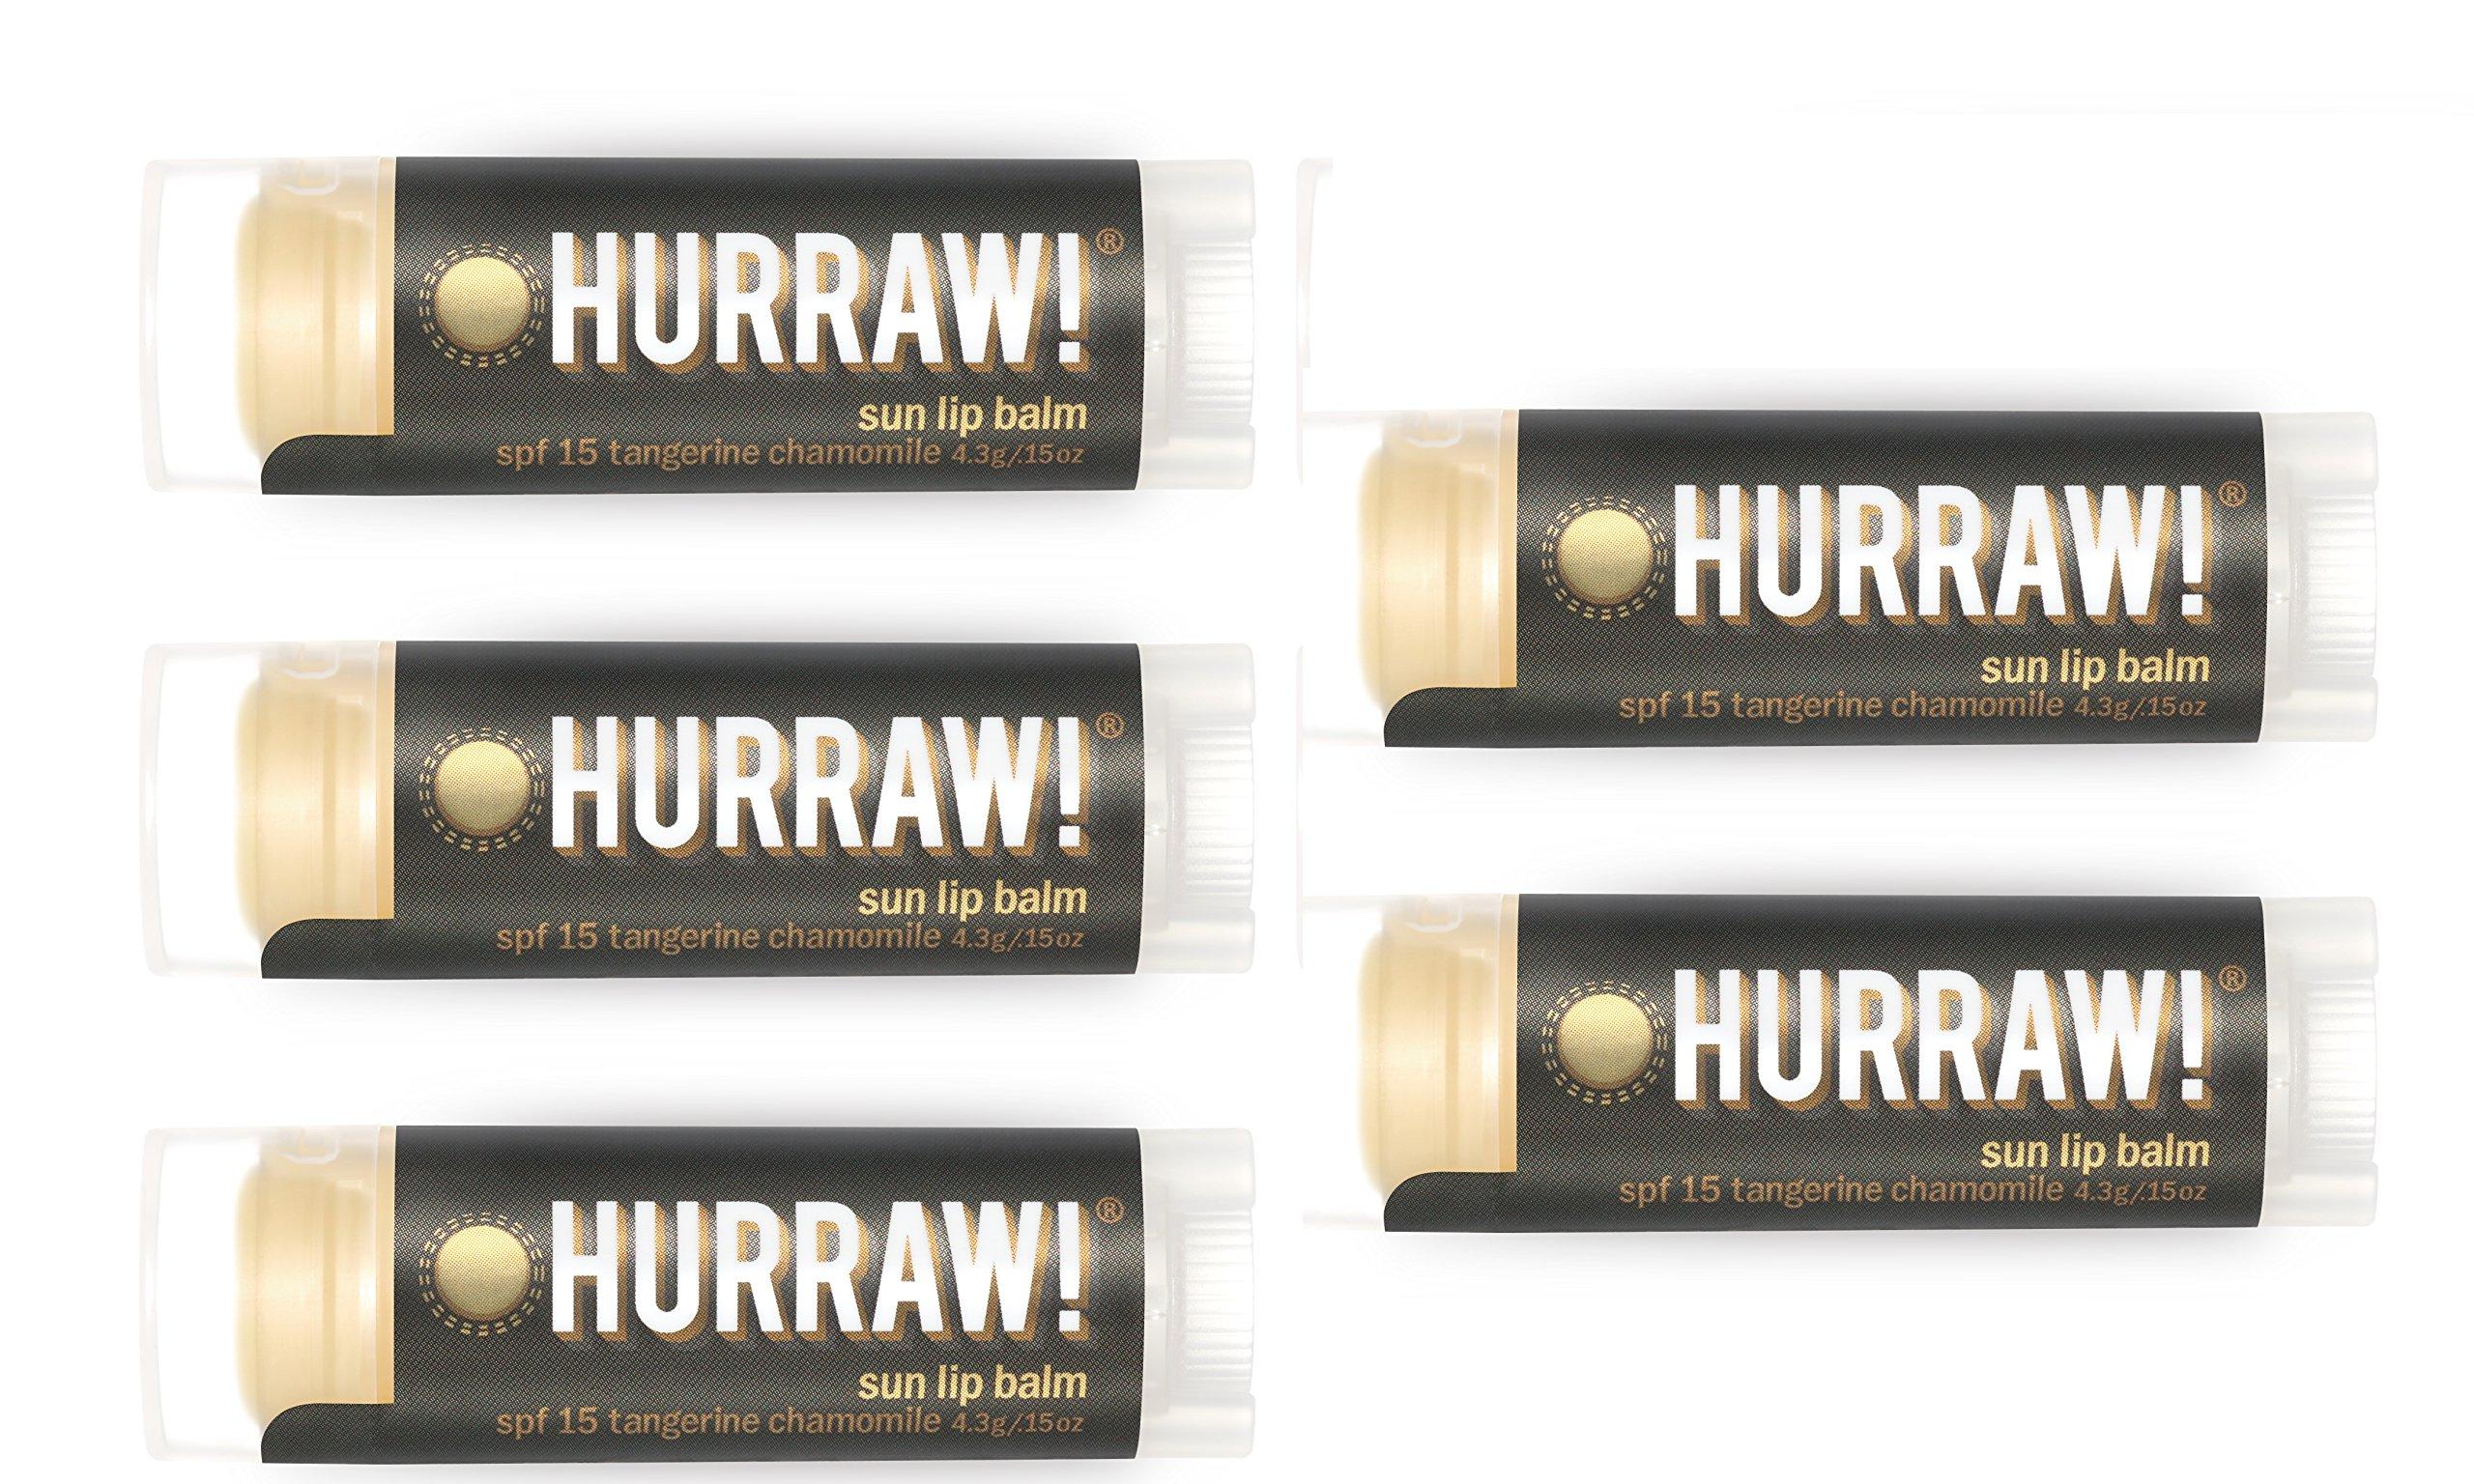 HURRAW! Sun (5 Pack) Lip Balm: Sun Protection, SPF 15, Zinc Oxide, Organic, Certified Vegan, Cruelty Free, Non-GMO, Gluten Free, All Natural – Luxury Lip Balm Made in The USA – Sun (5 Pack)